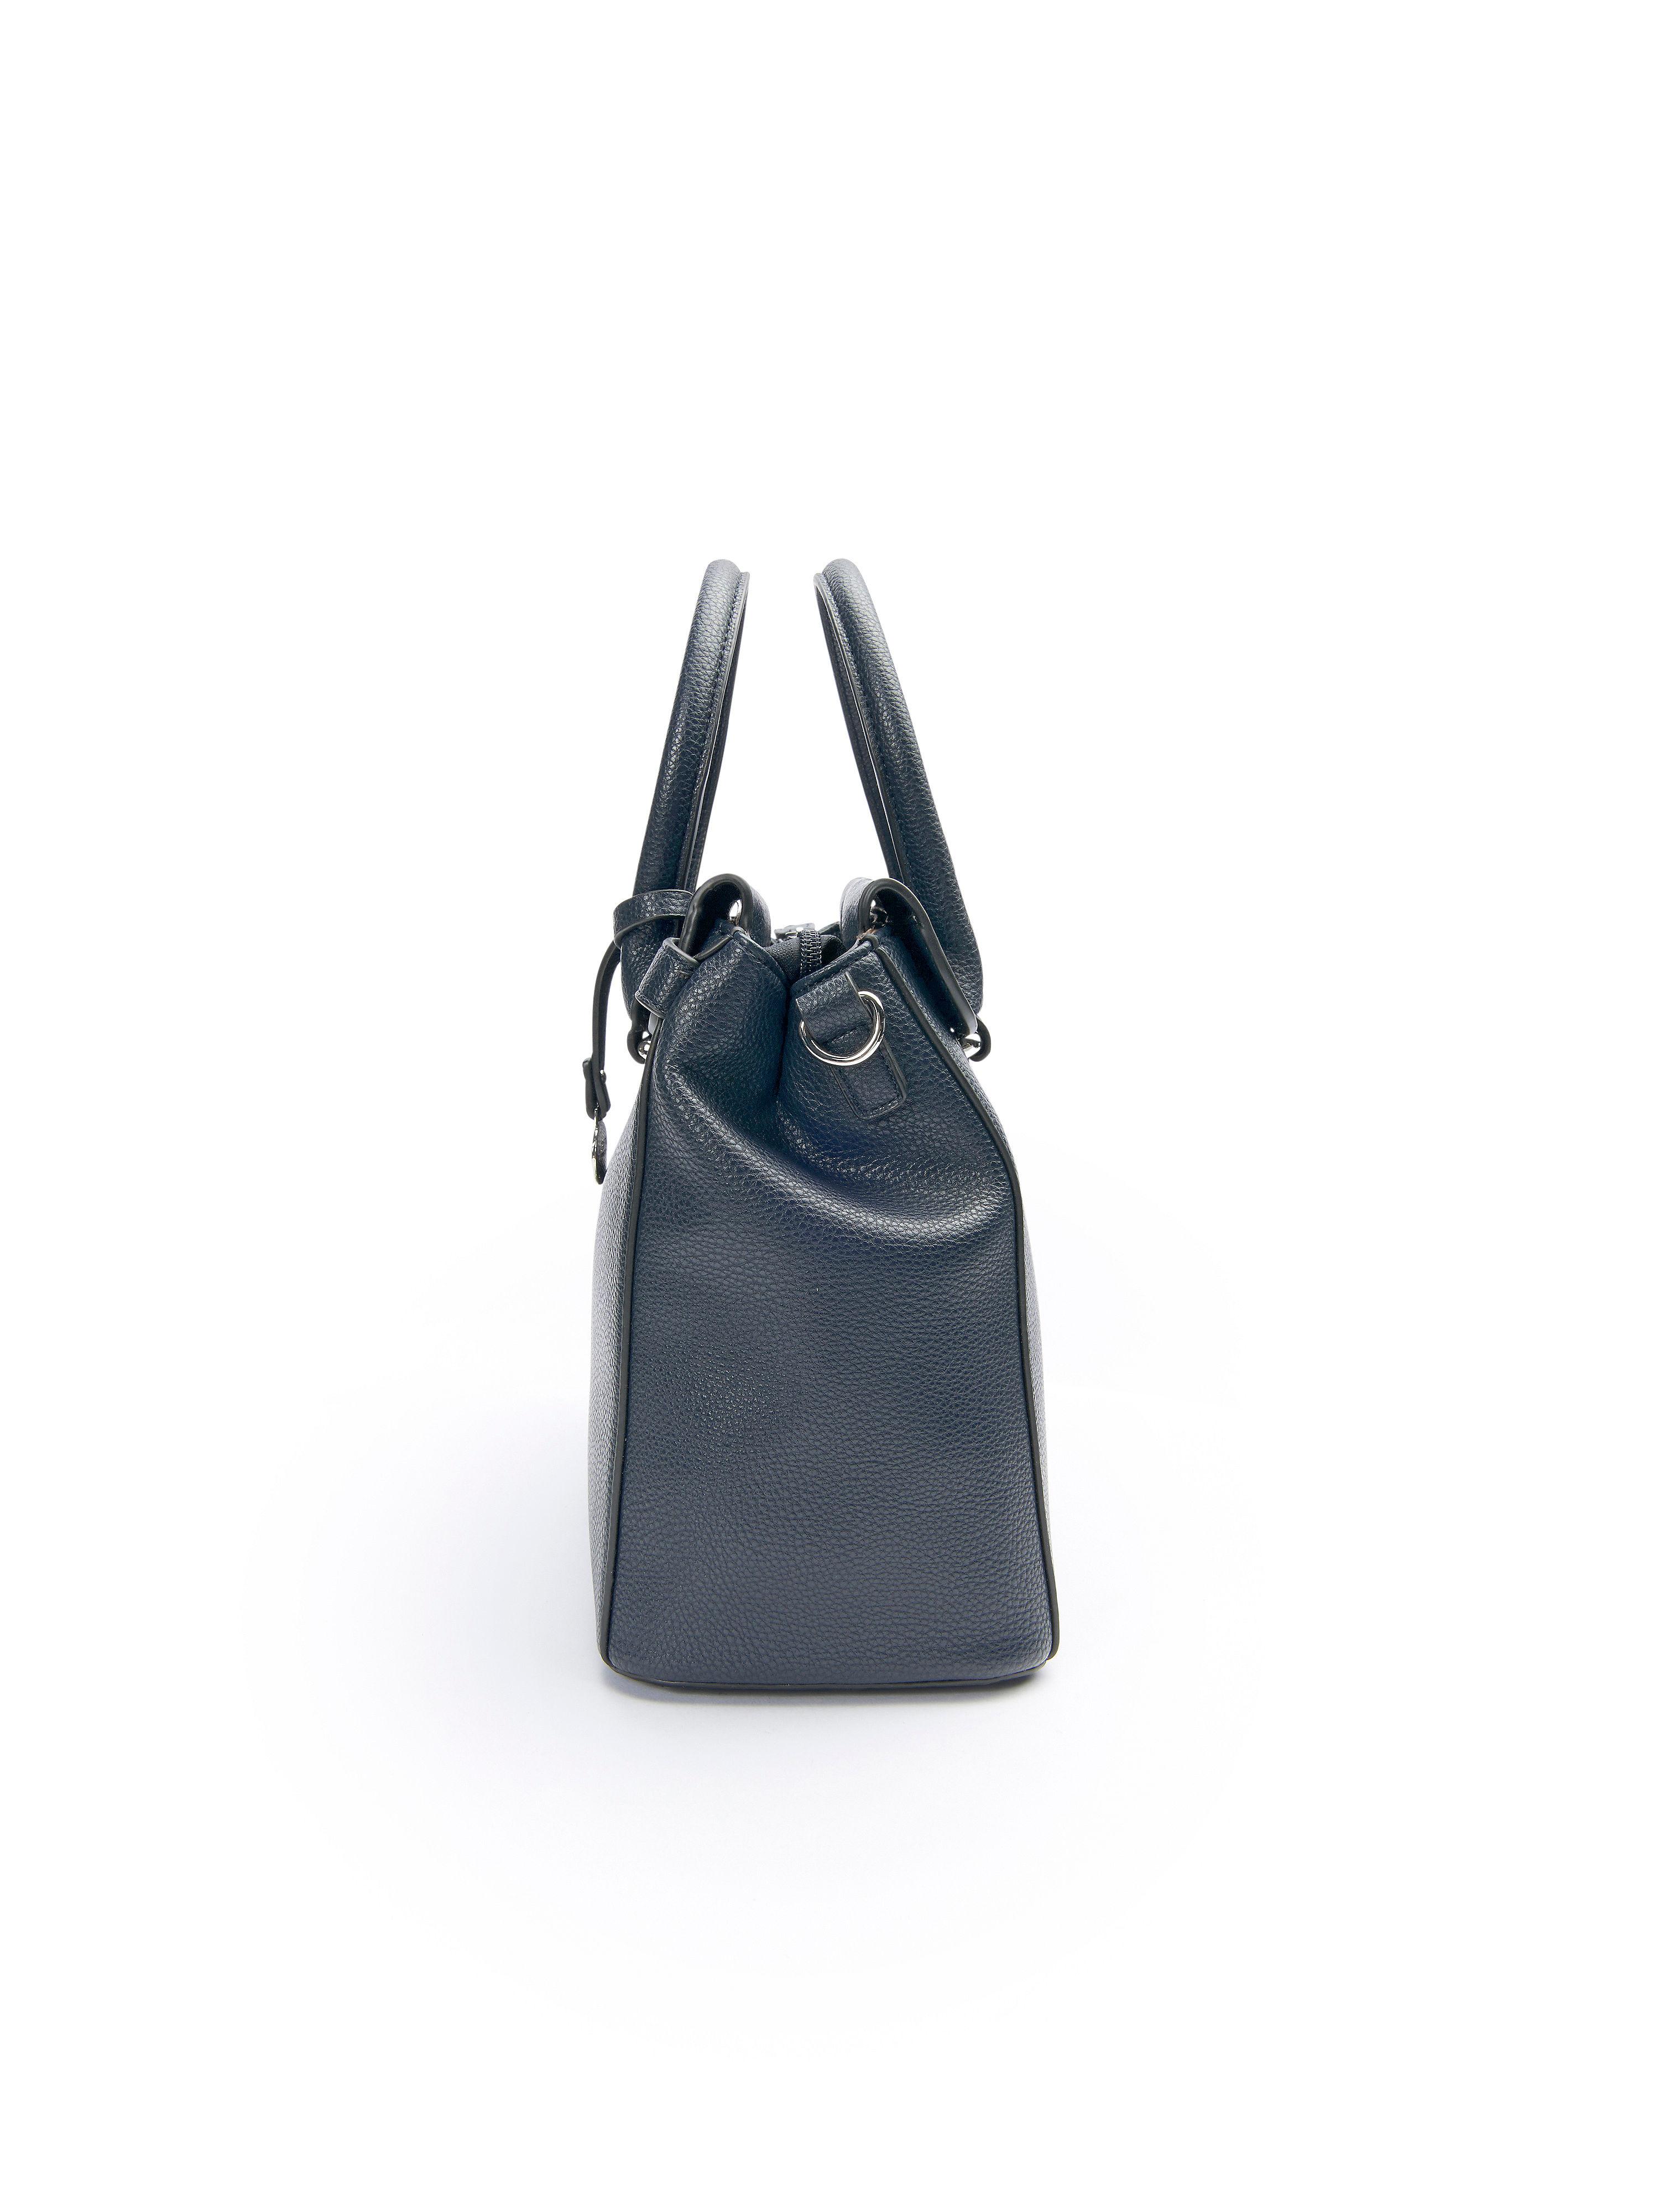 Handbag from L. Credi blue